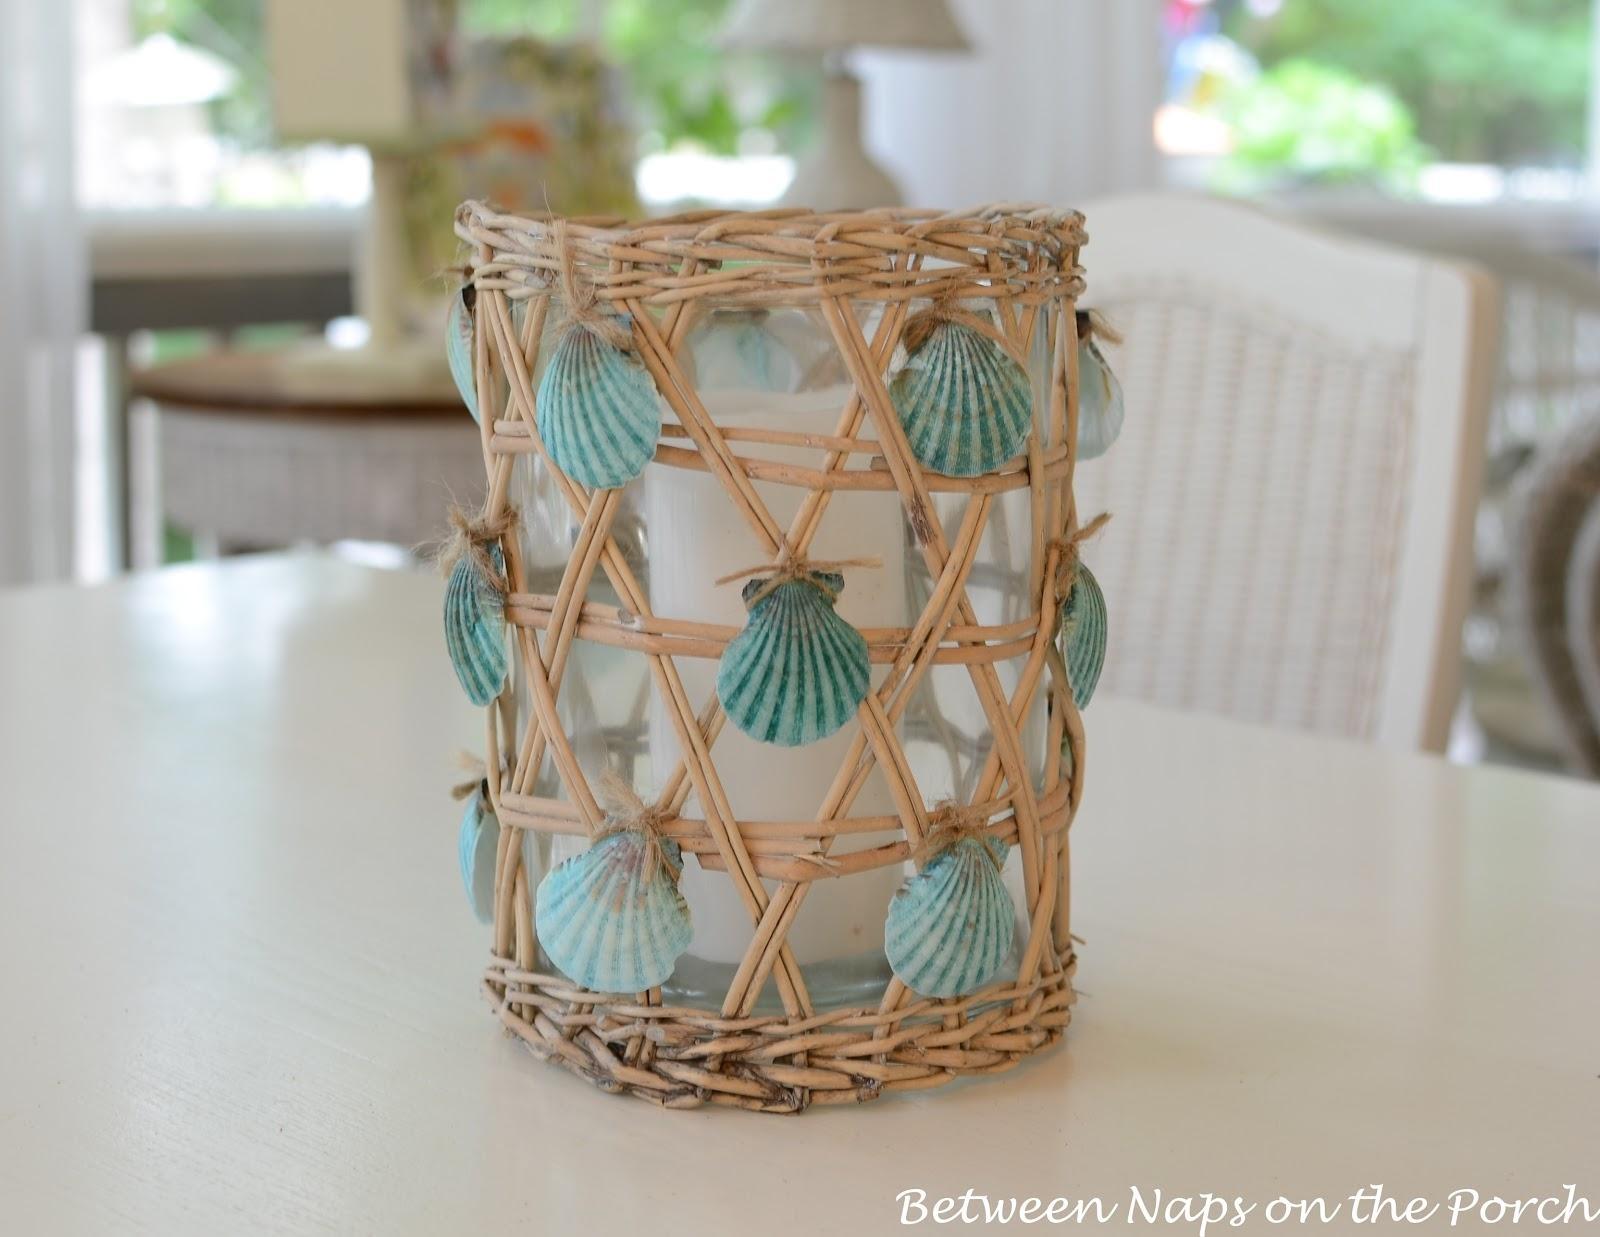 Tips: Seashell Collection | Seashell Crafts | Wall Art With Seashells Inside Wall Art With Seashells (Image 18 of 20)